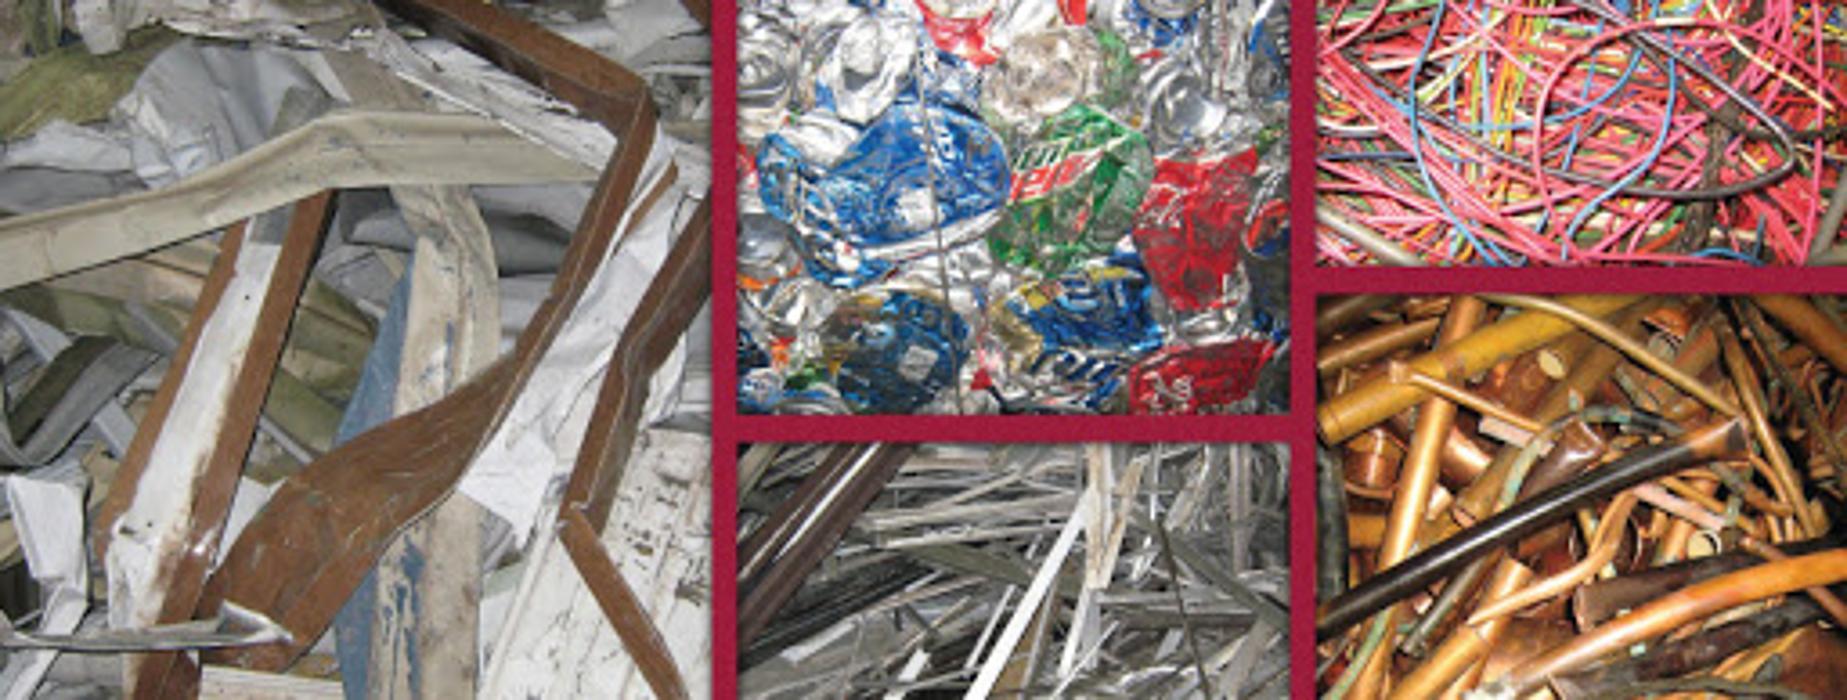 City Scrap Metal Inc - Lees Summit, MO